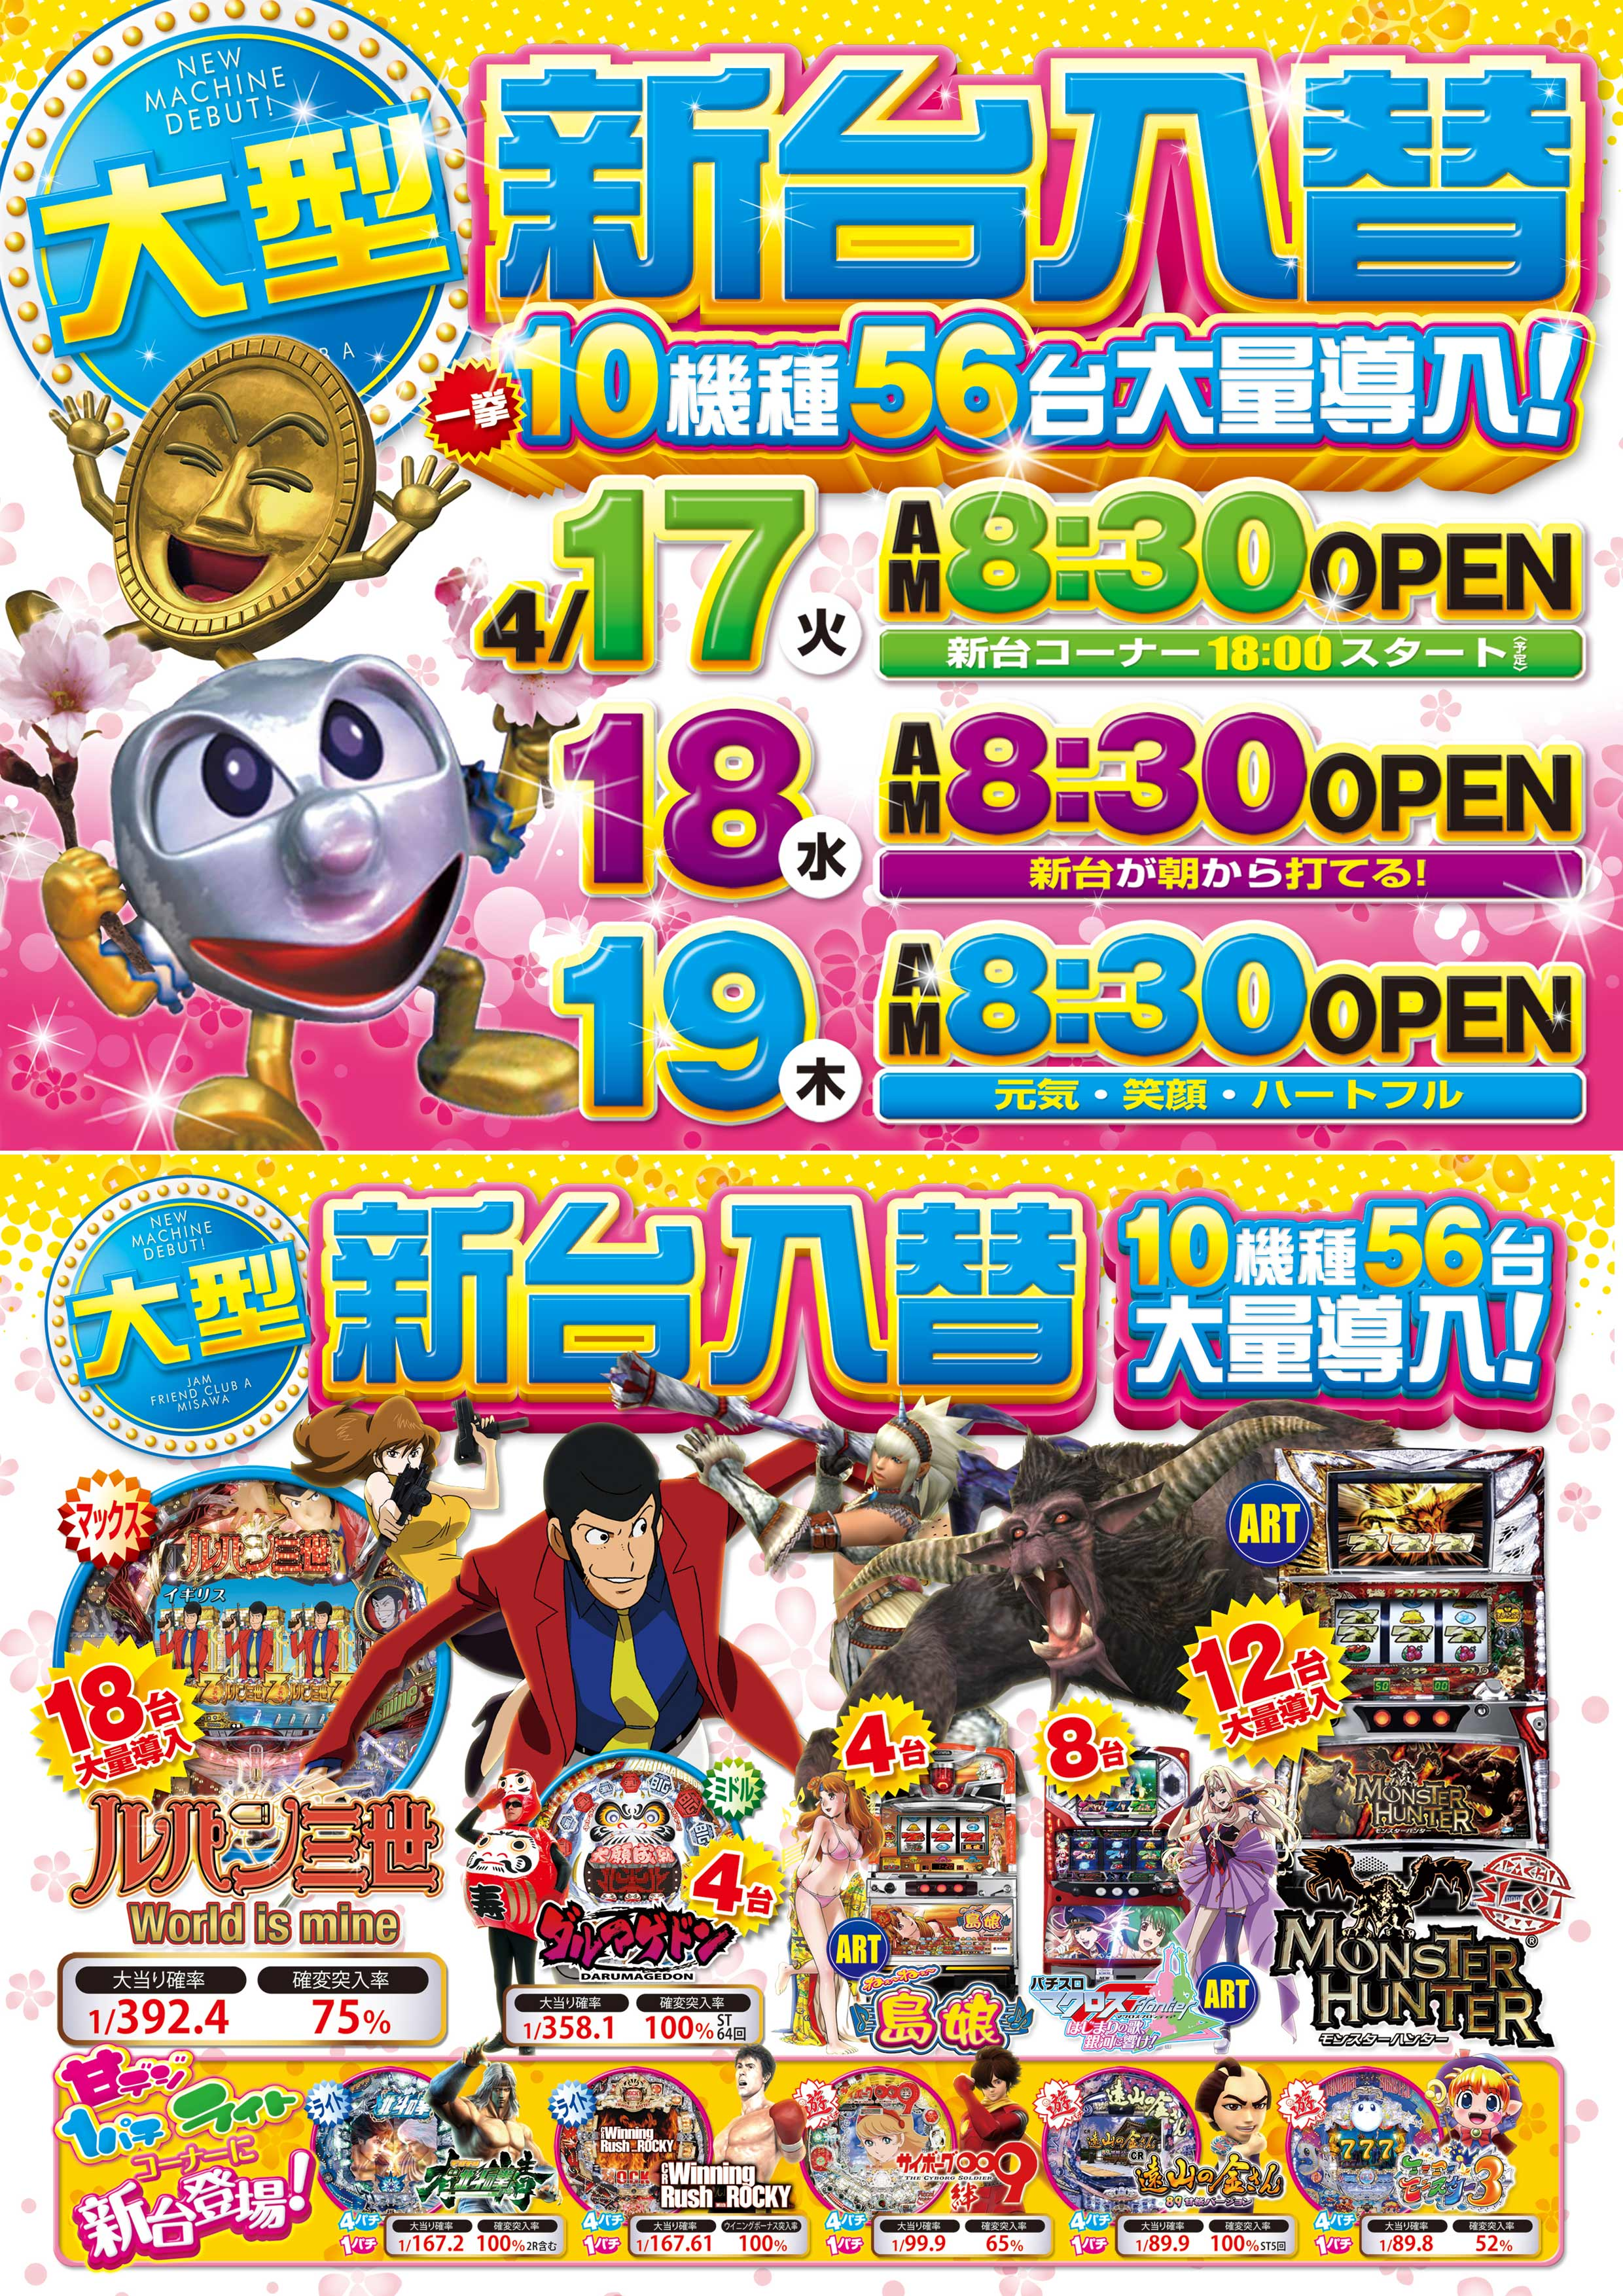 http://jam-fc.jp/information/images/misawa4.17.jpg